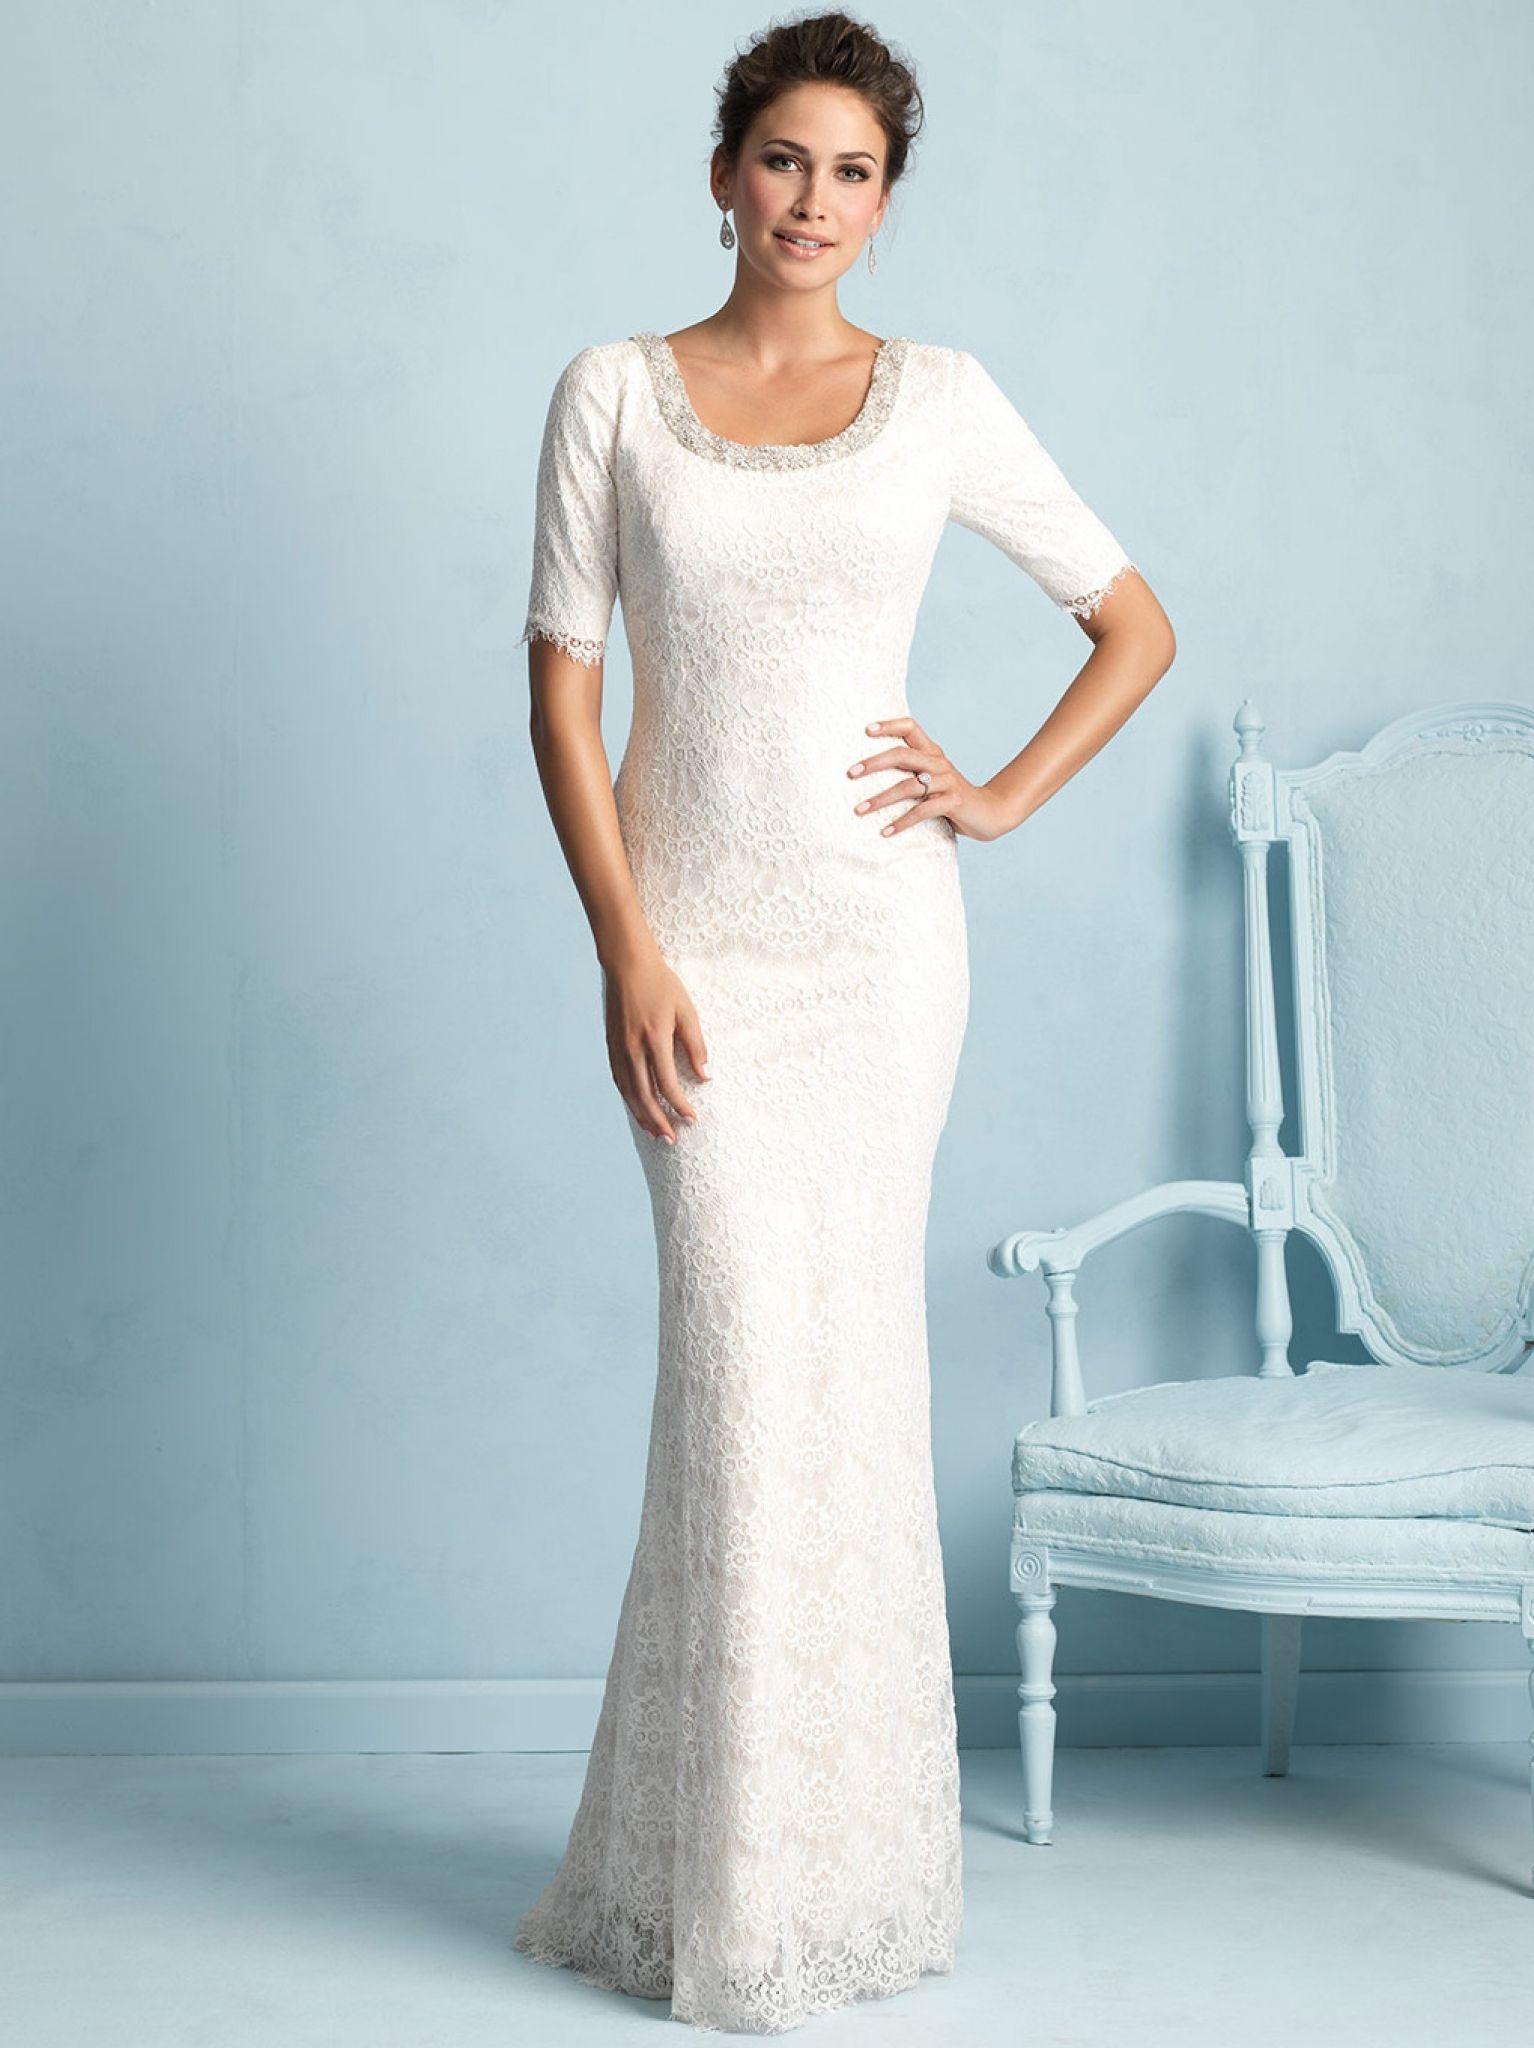 second wedding dress ideas - dressy dresses for weddings Check more ...